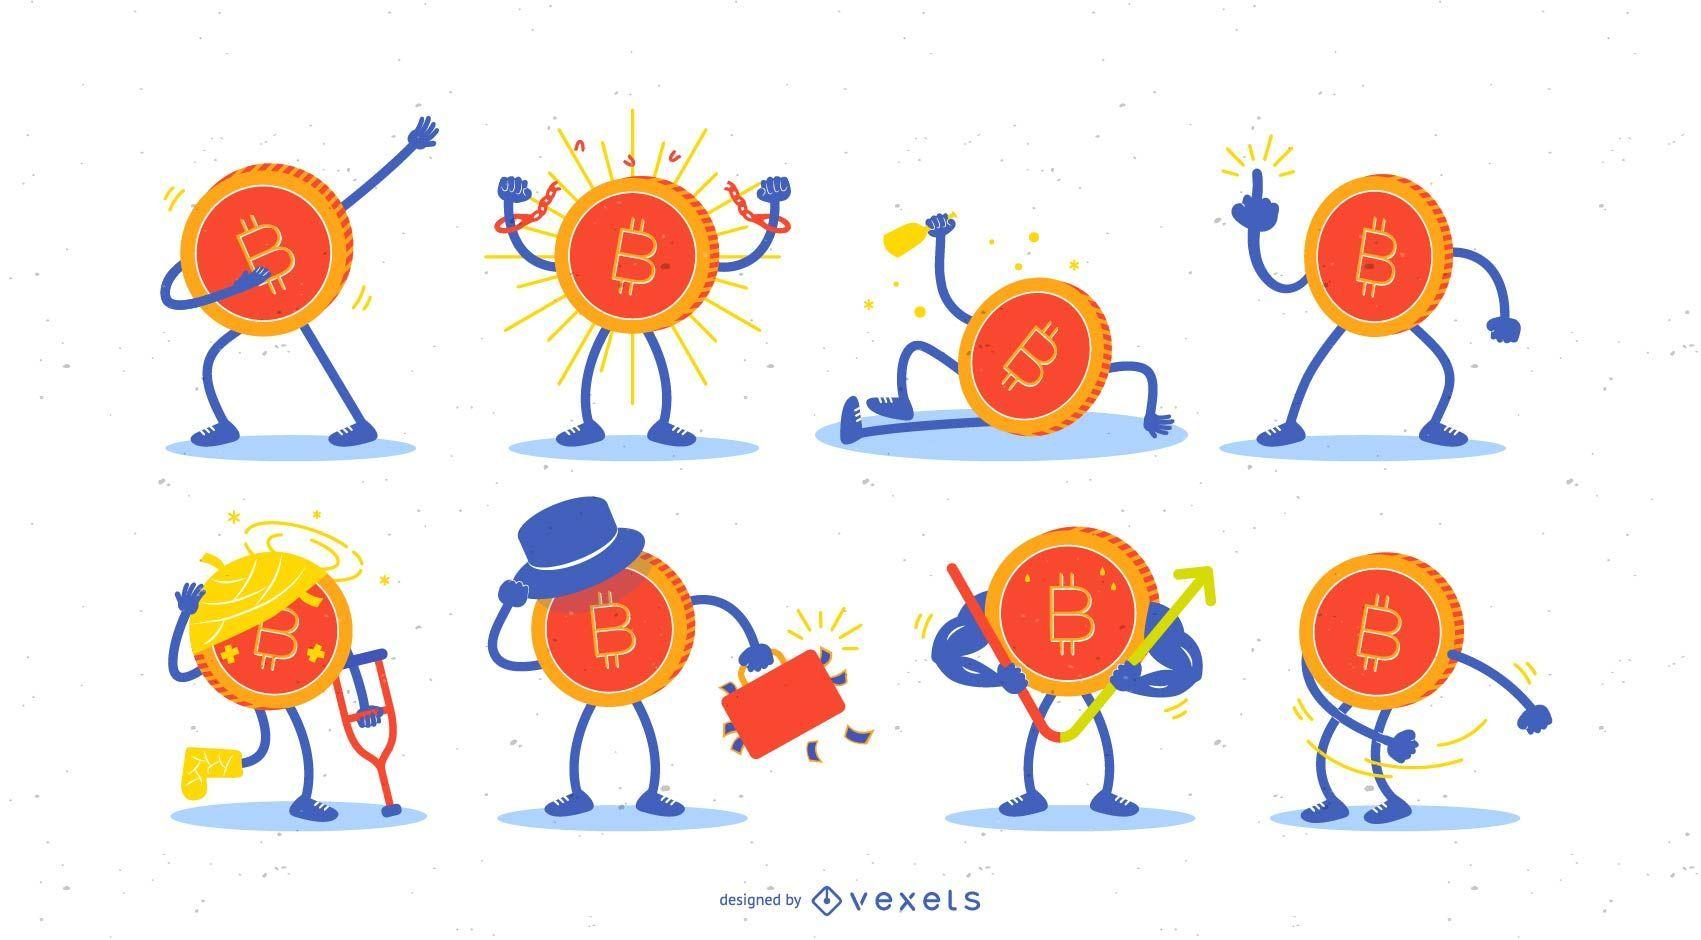 Bitcoin Characters Illustration Set